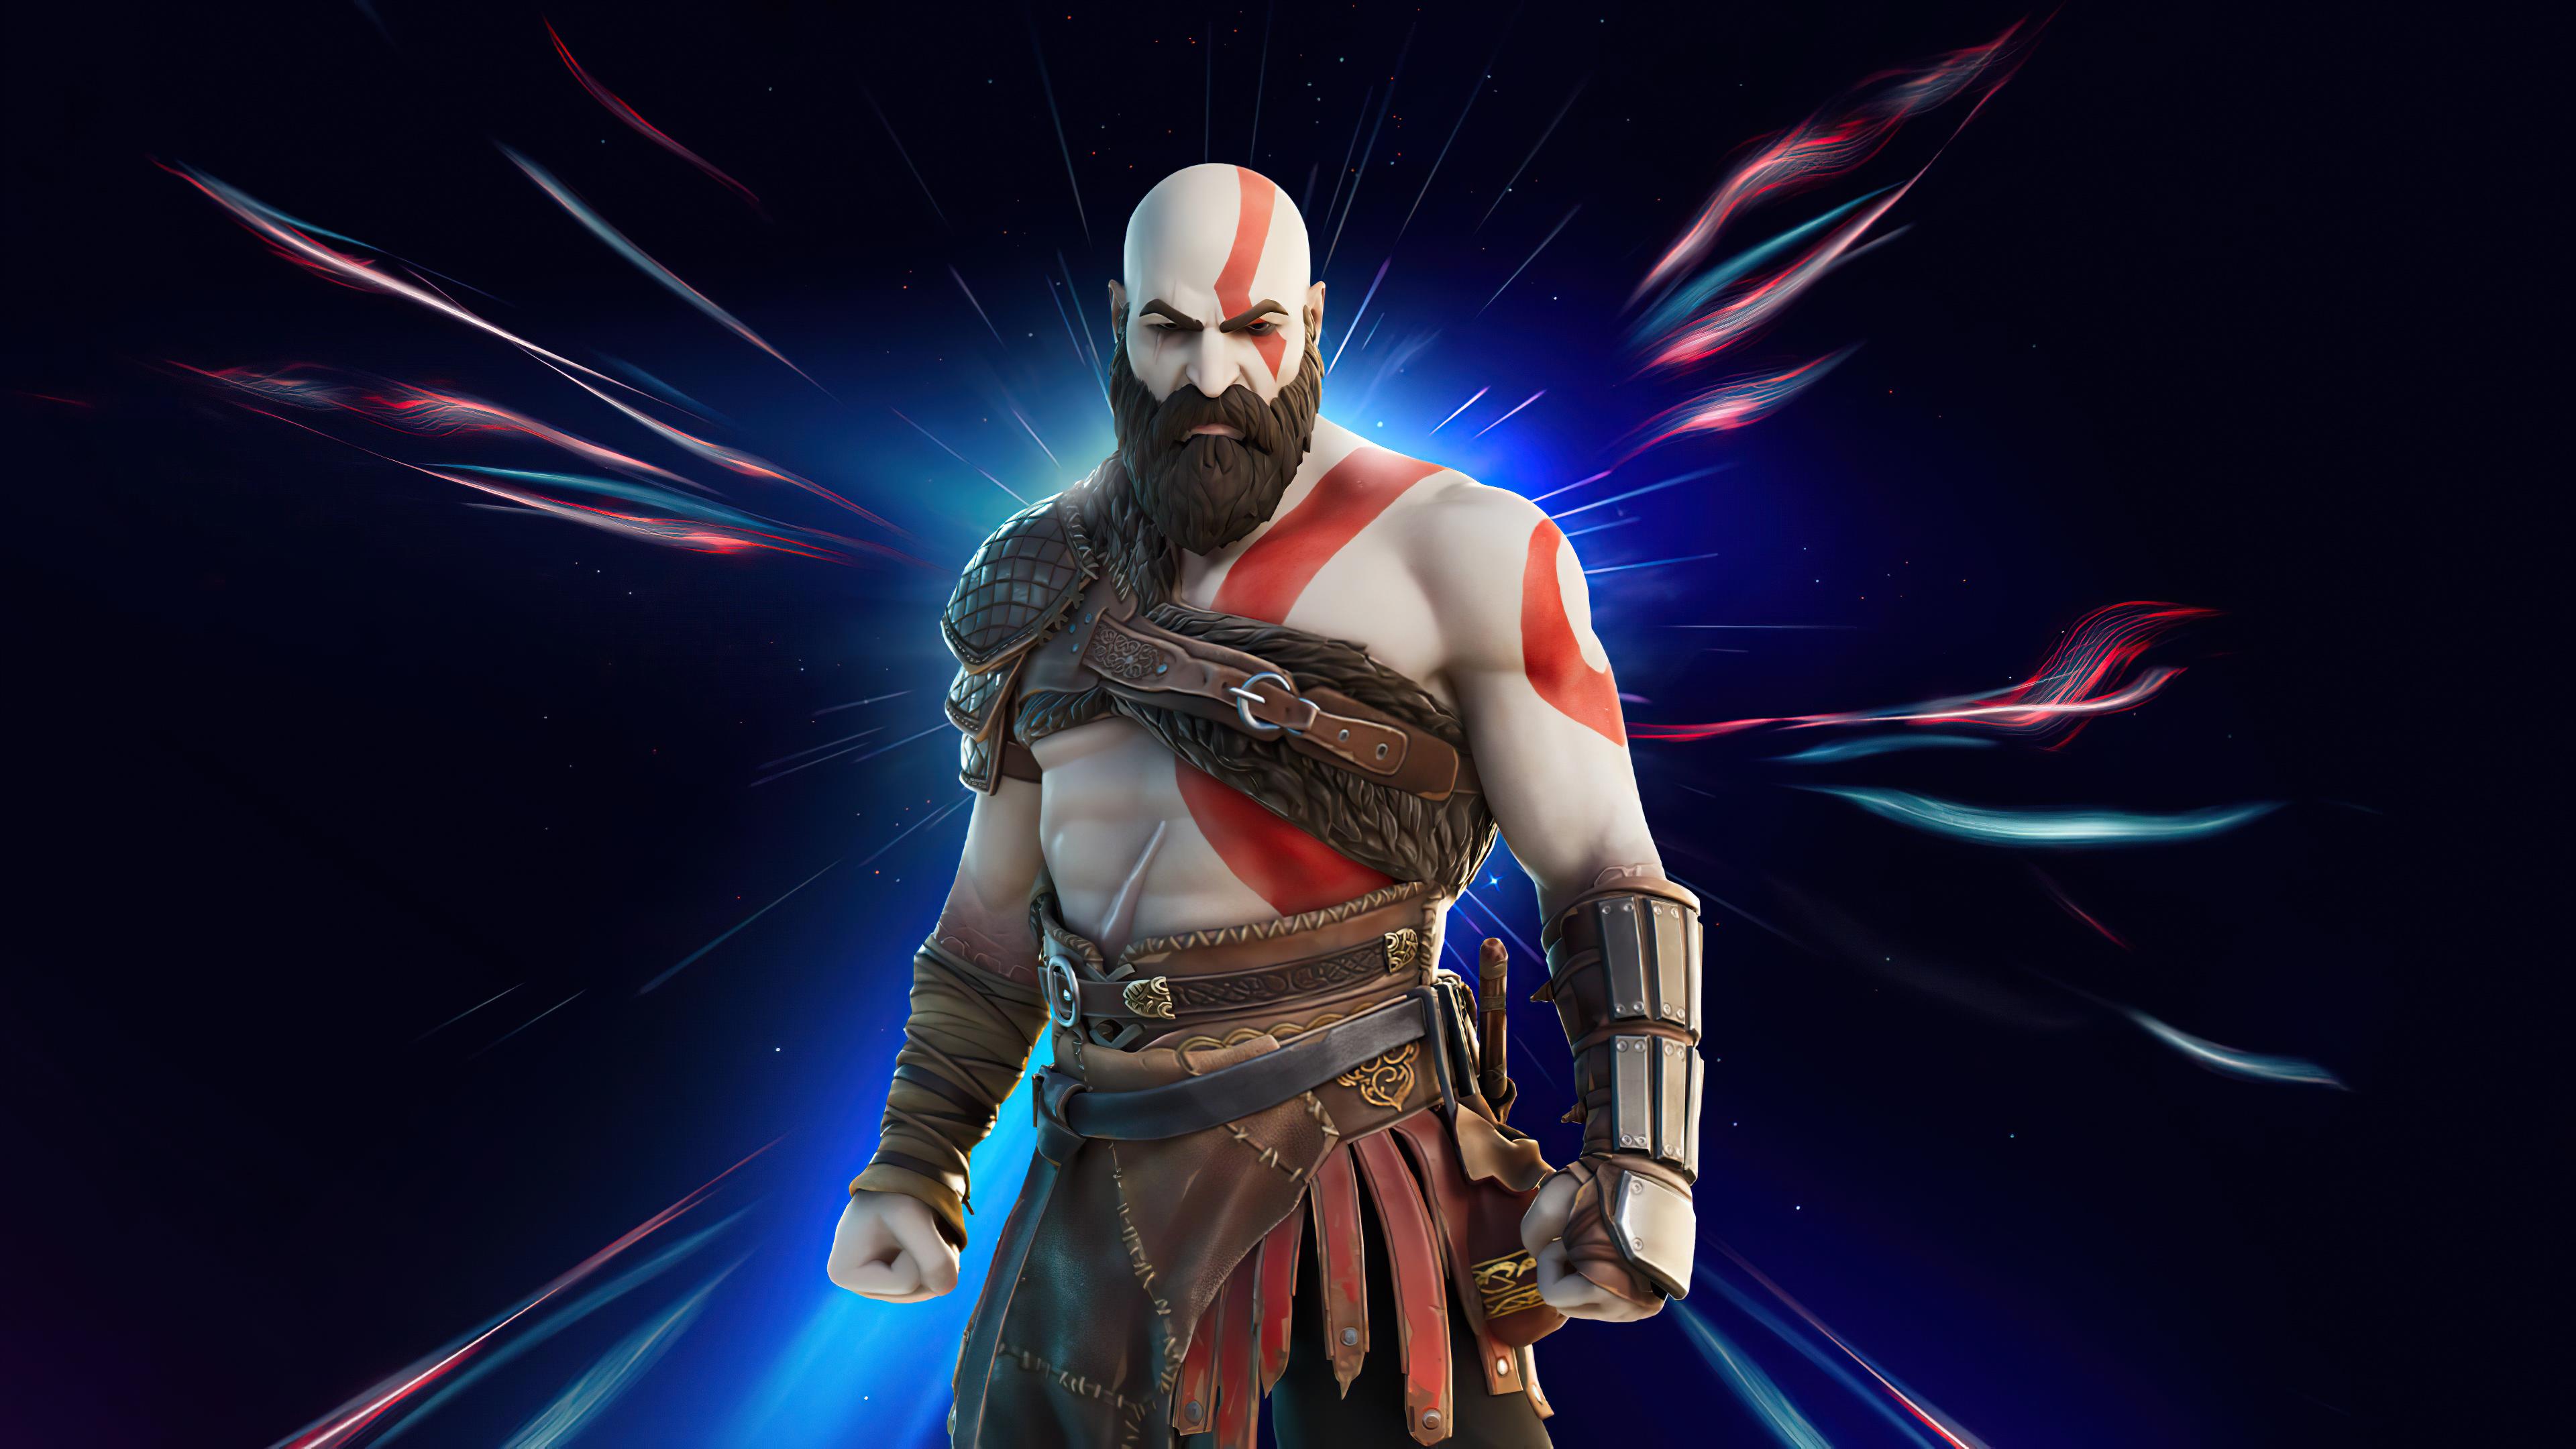 kratos in fortnite chapter 2 season 5 4k 1615137957 - Kratos In Fortnite Chapter 2 Season 5 4k - Kratos In Fortnite Chapter 2 Season 5 4k wallpapers